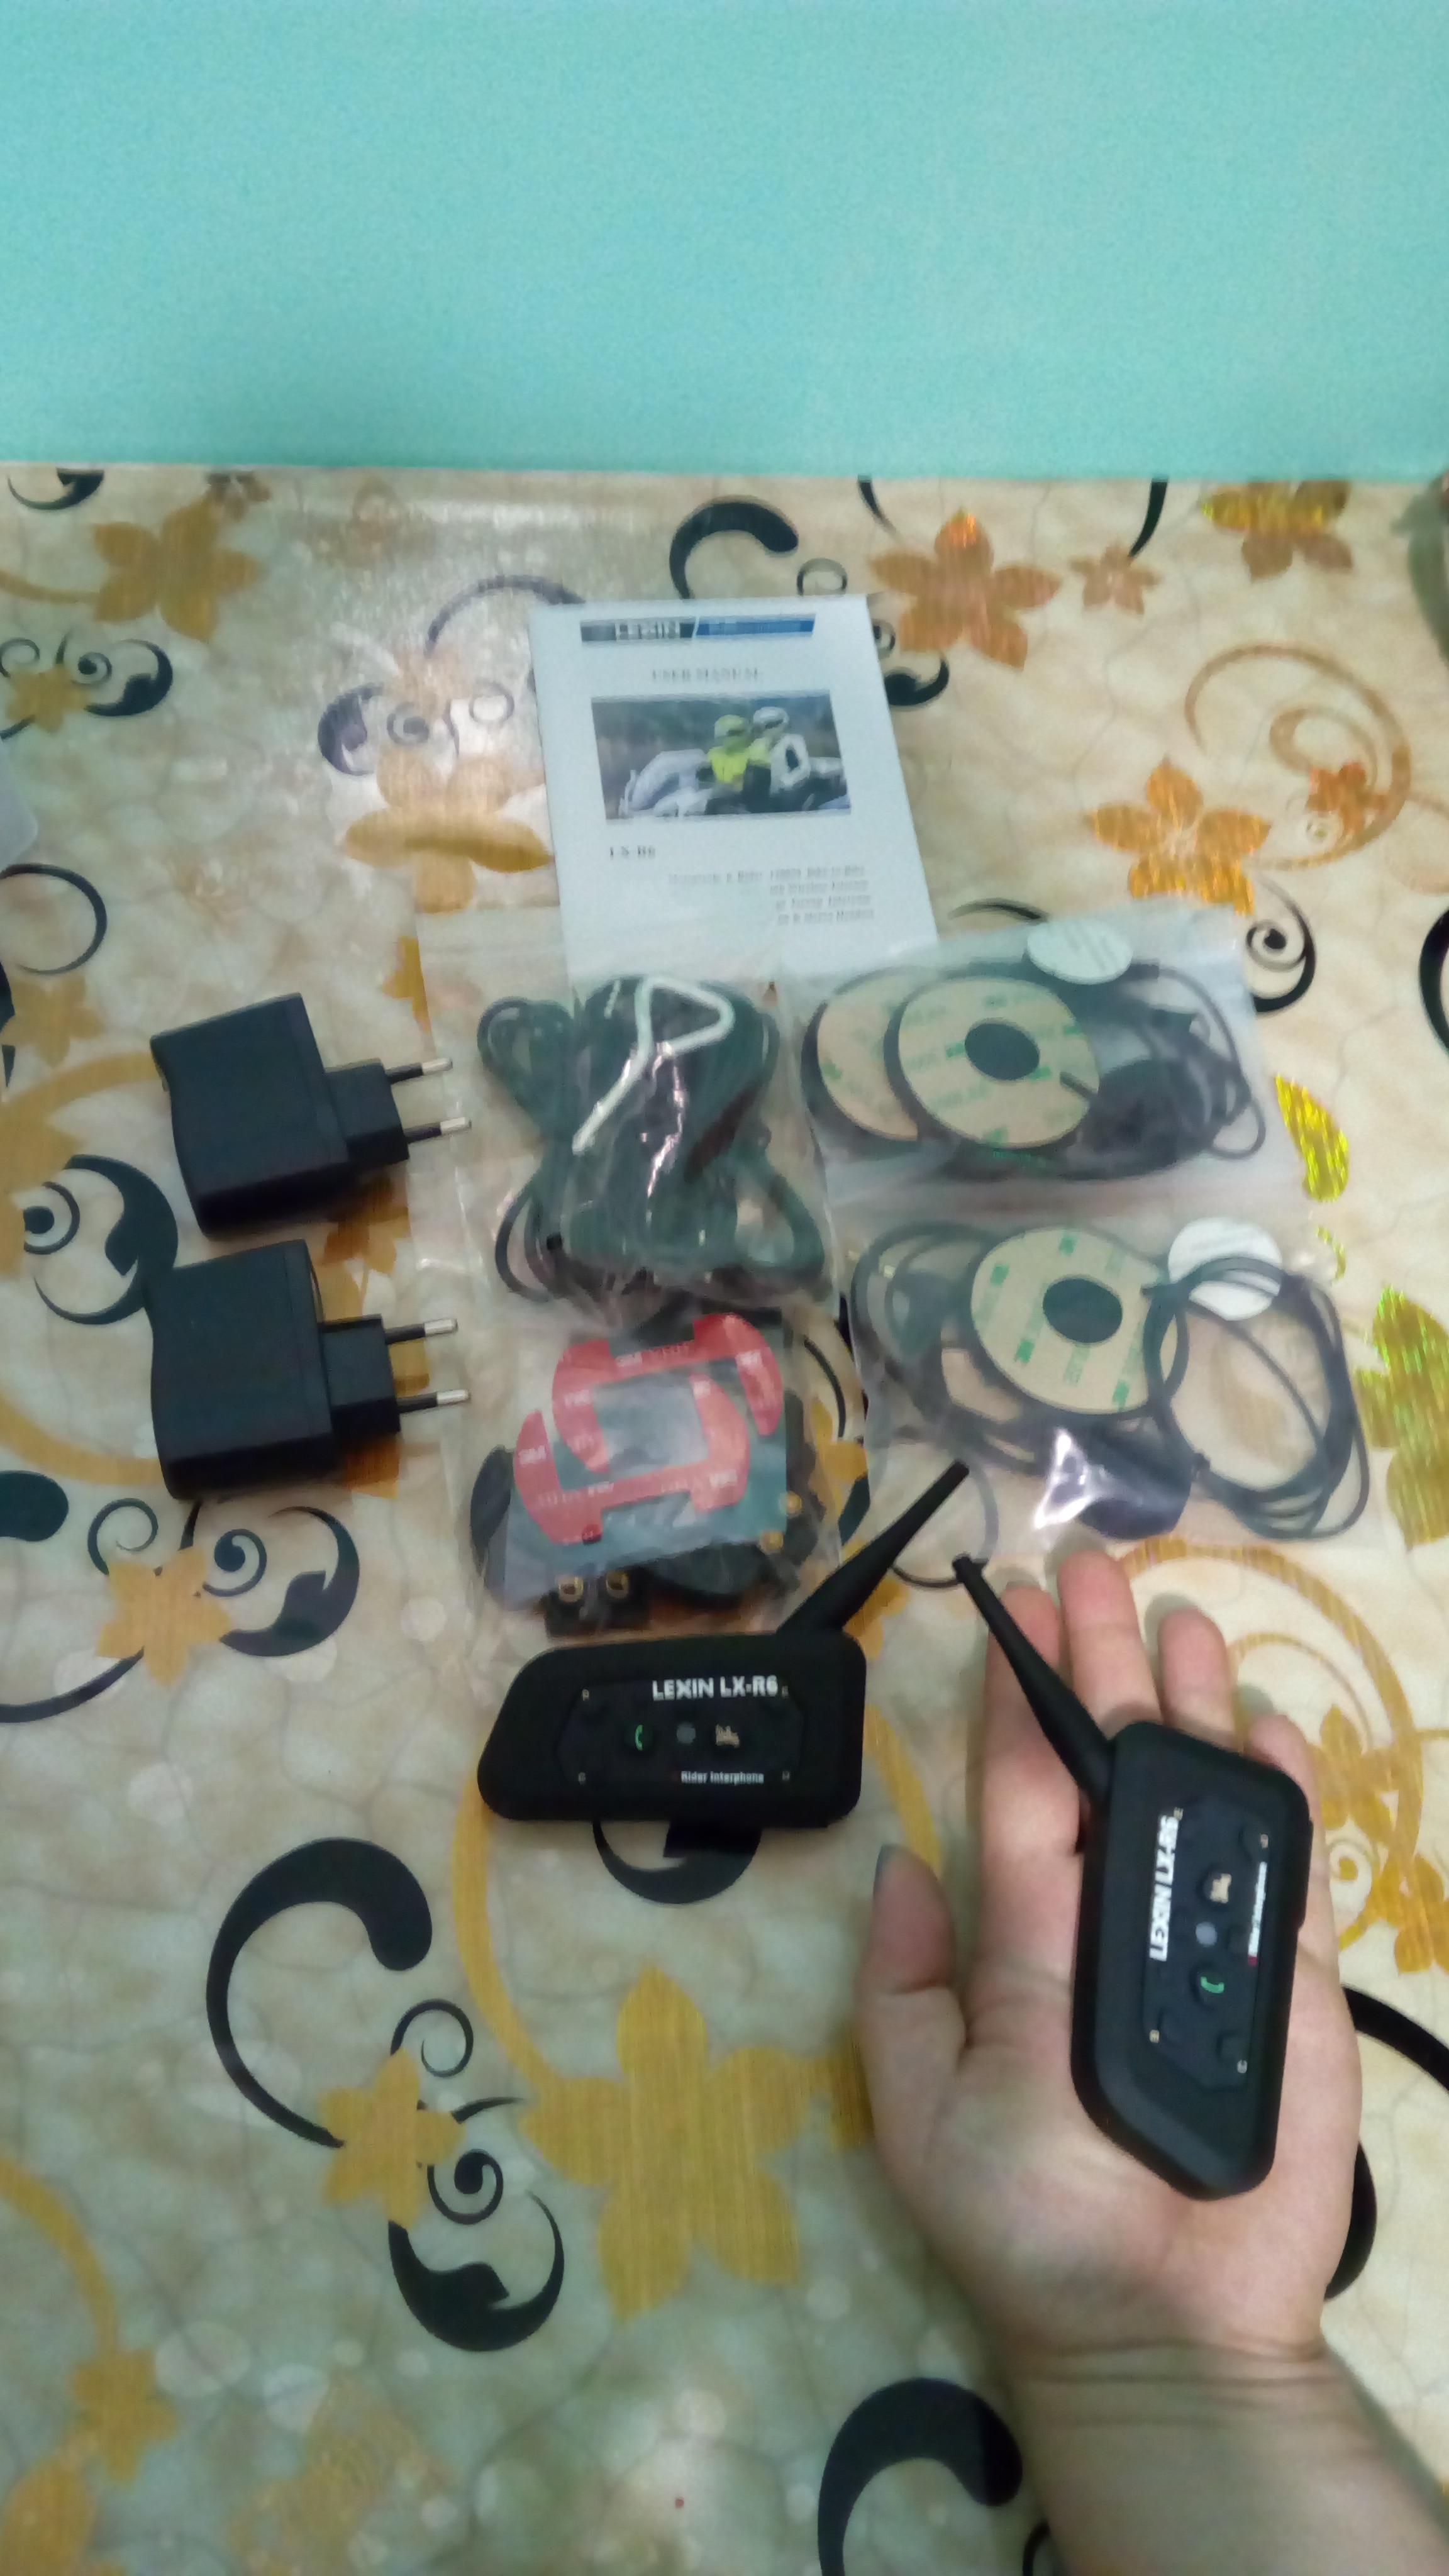 2PCS Lexin R6 Motorcycle Bluetooth Helmet Headsets Intercom for 6 riders BT Wireless intercomunicador Interphone MP3